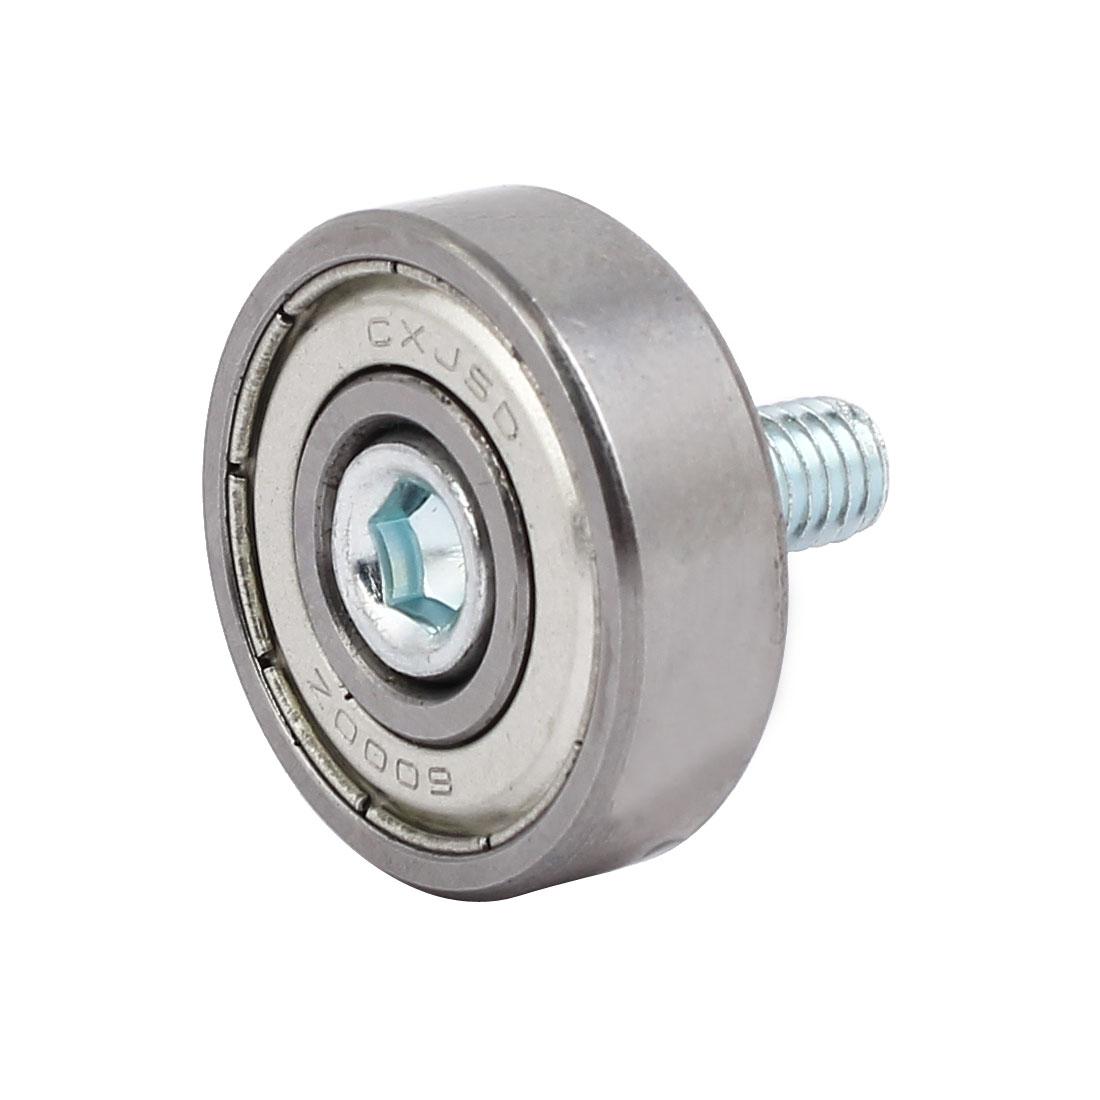 M6 x 12mm Screw Thread F Type Idler Bearing Pulley 14mm x 26mm x 8mm